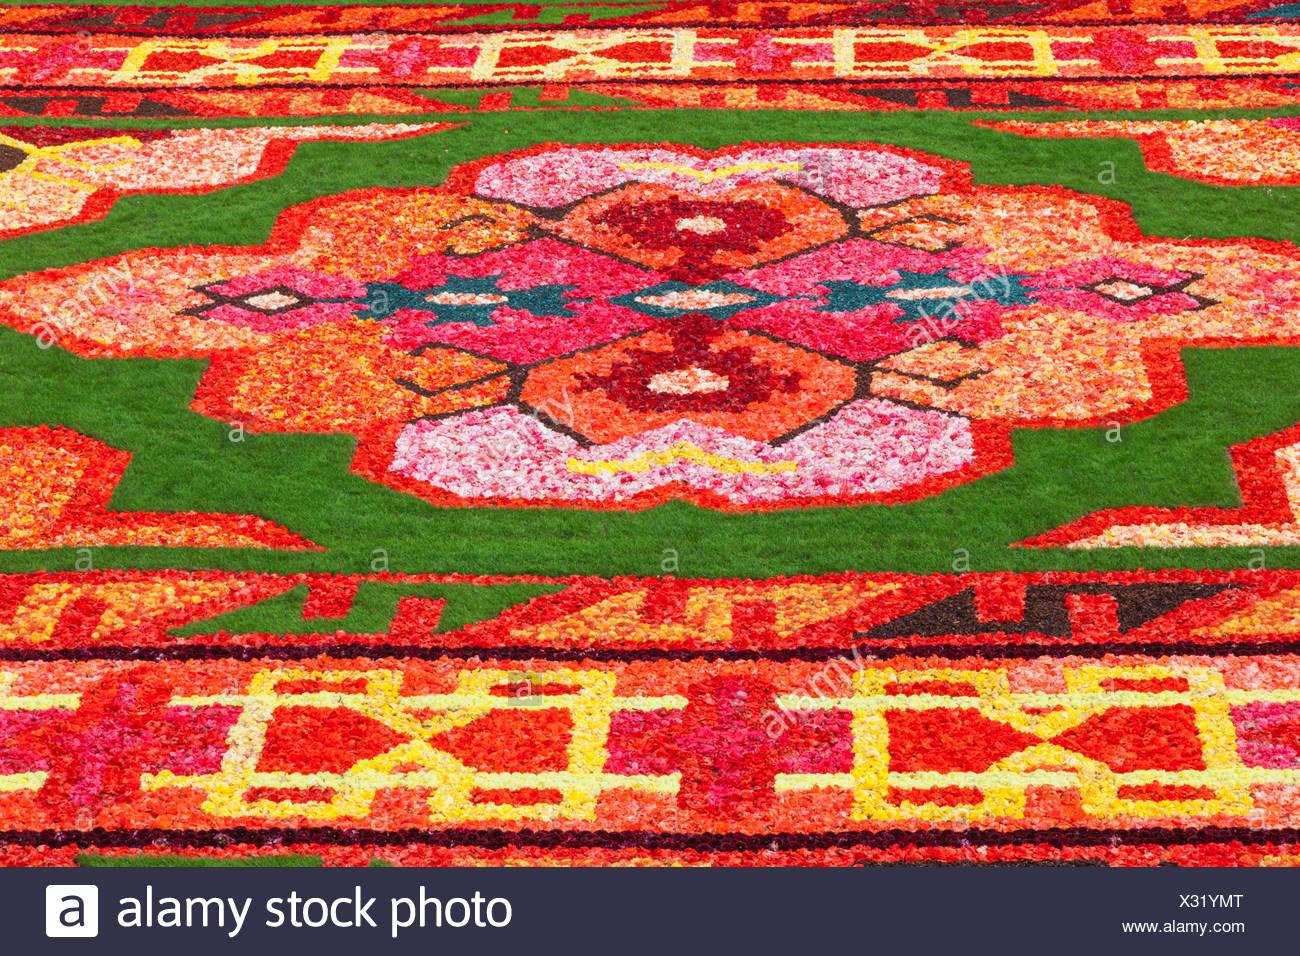 Belgien, Brüssel, Grand-Place, Teppich Blumenfest, Blumenmuster Stockbild